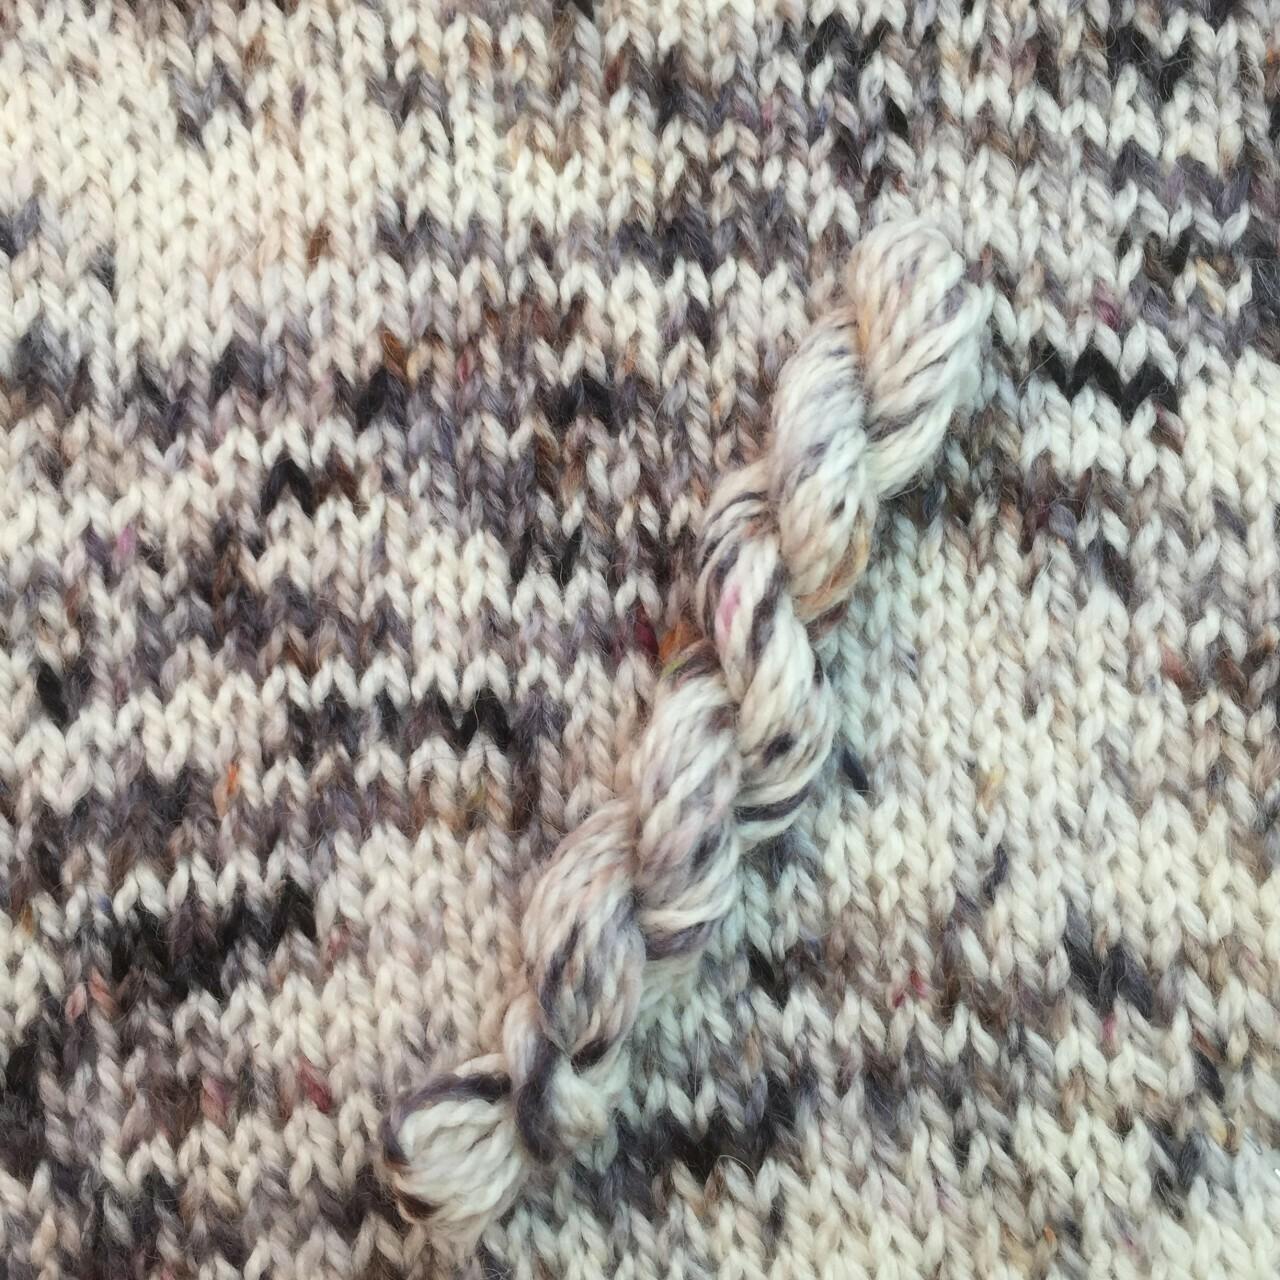 Symmetry Yarn - The Dreamin' Tree